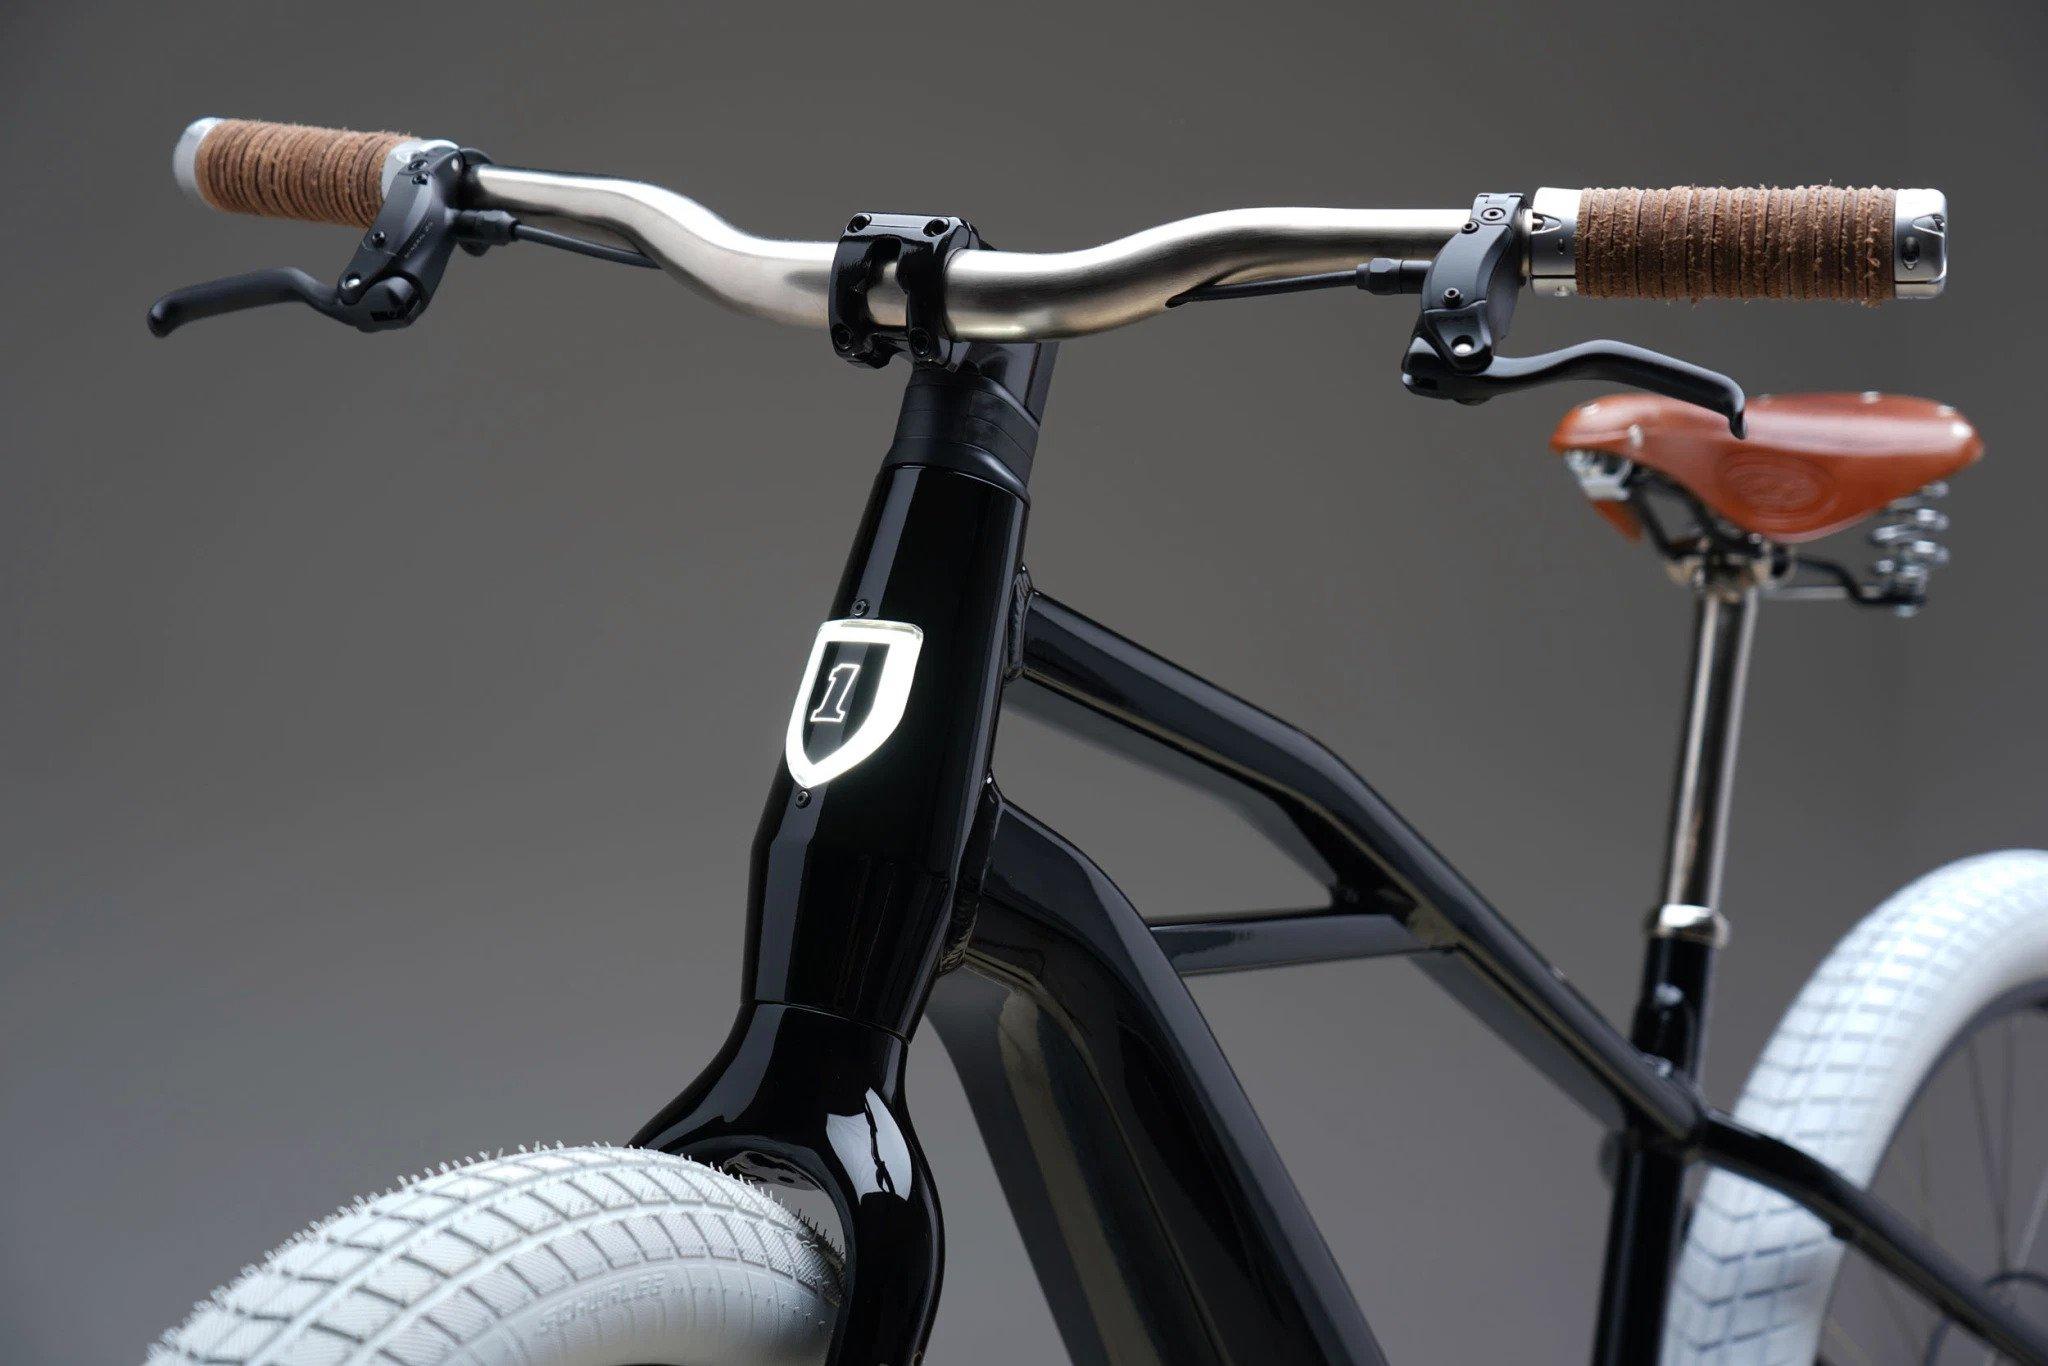 H D bike 2 - Harley-Davidson τώρα και ηλεκτρικά ποδήλατα